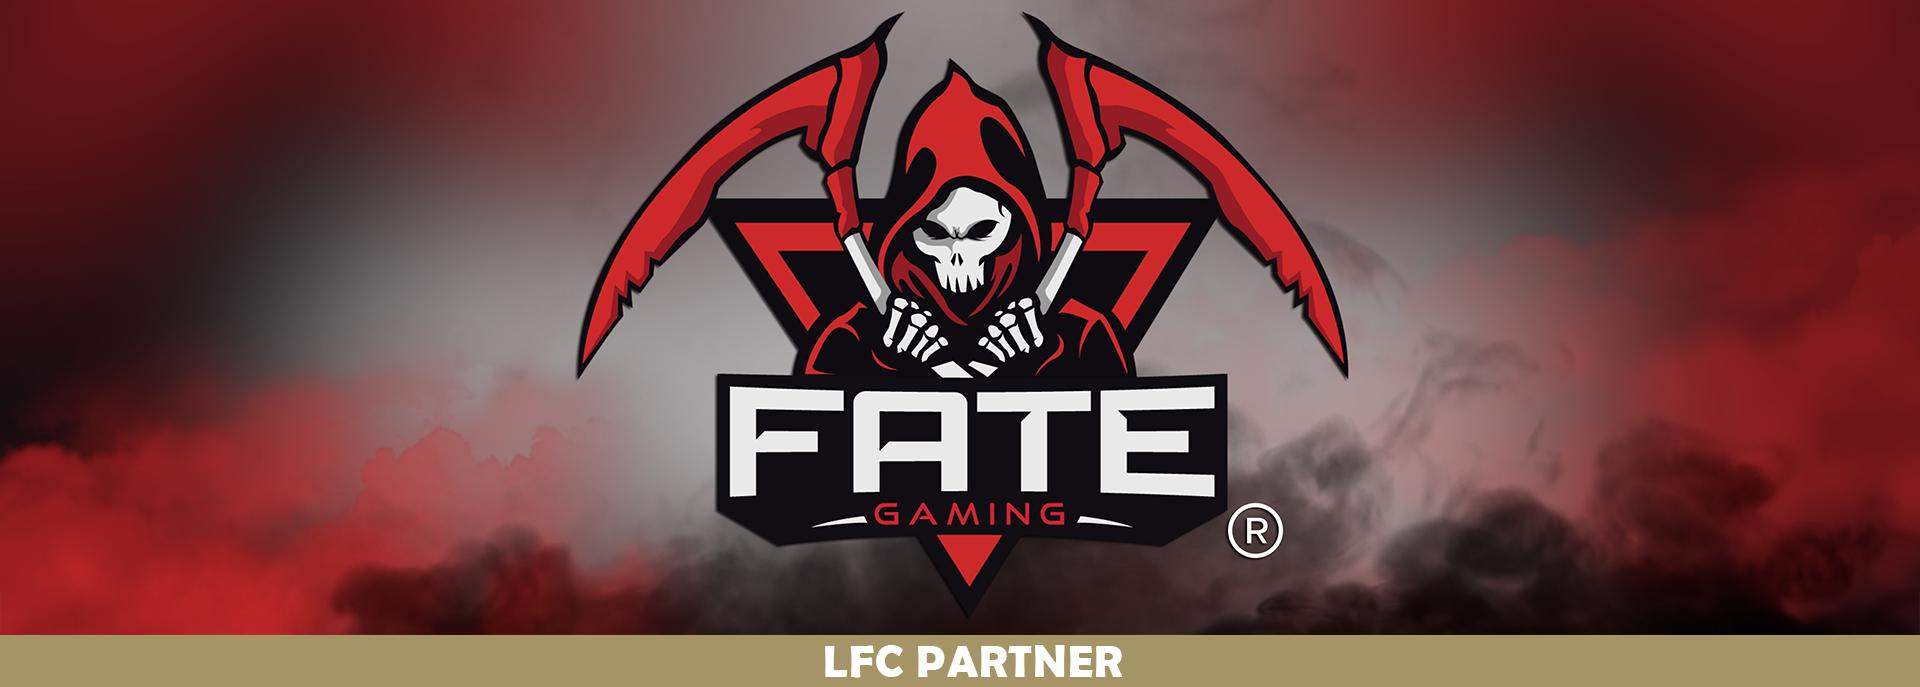 LFC Partner